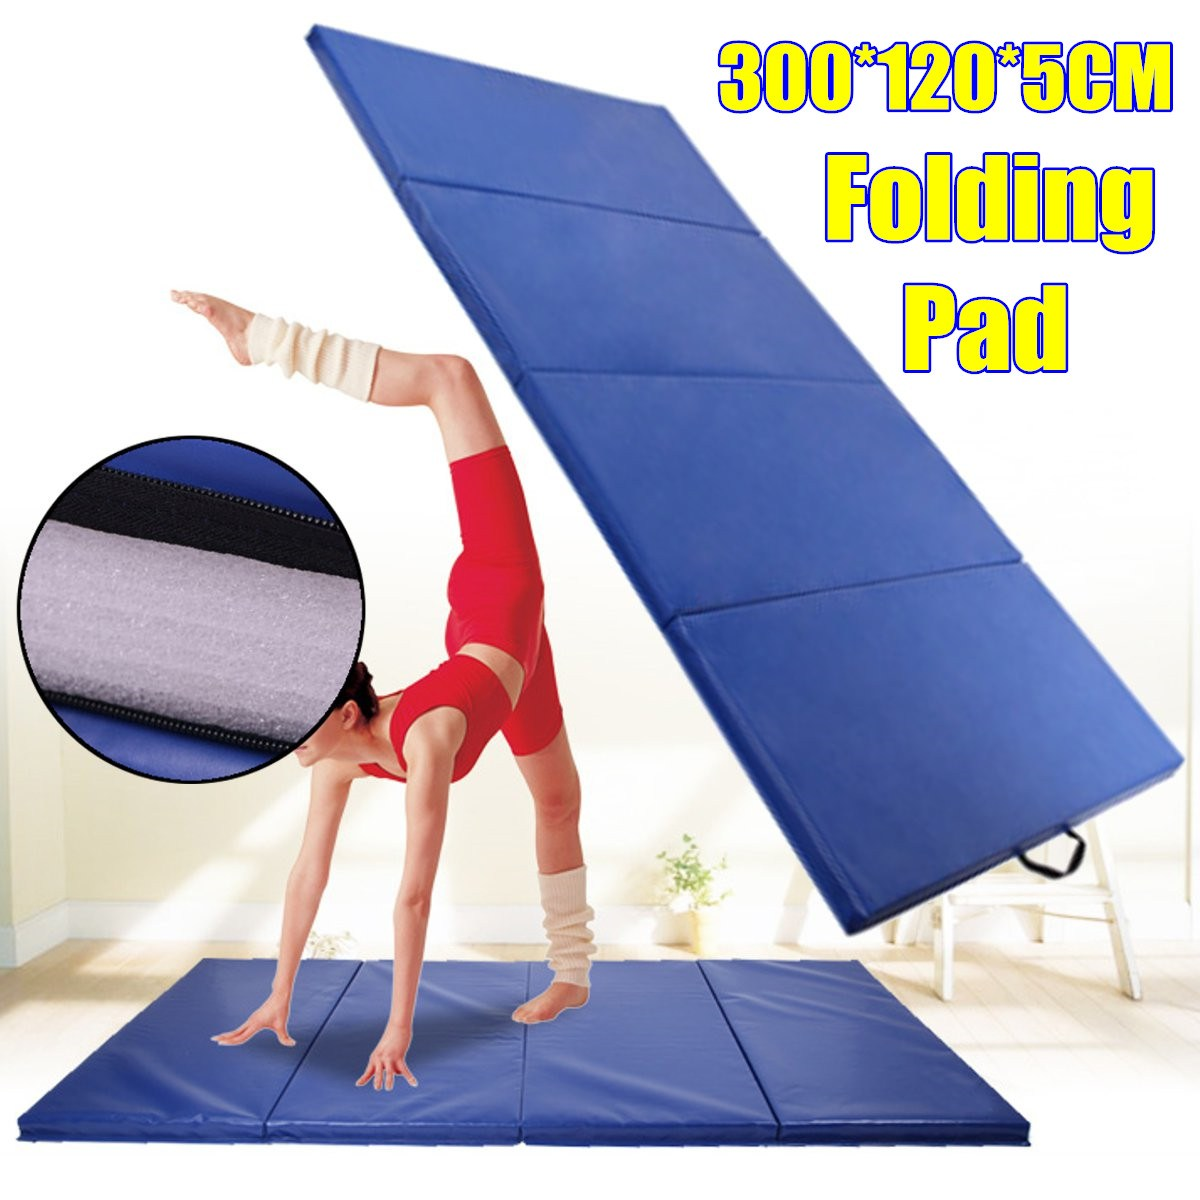 com tumbling outdoors x dp mat gymnastics mats tumbl amazon folding sports trak xmpfl